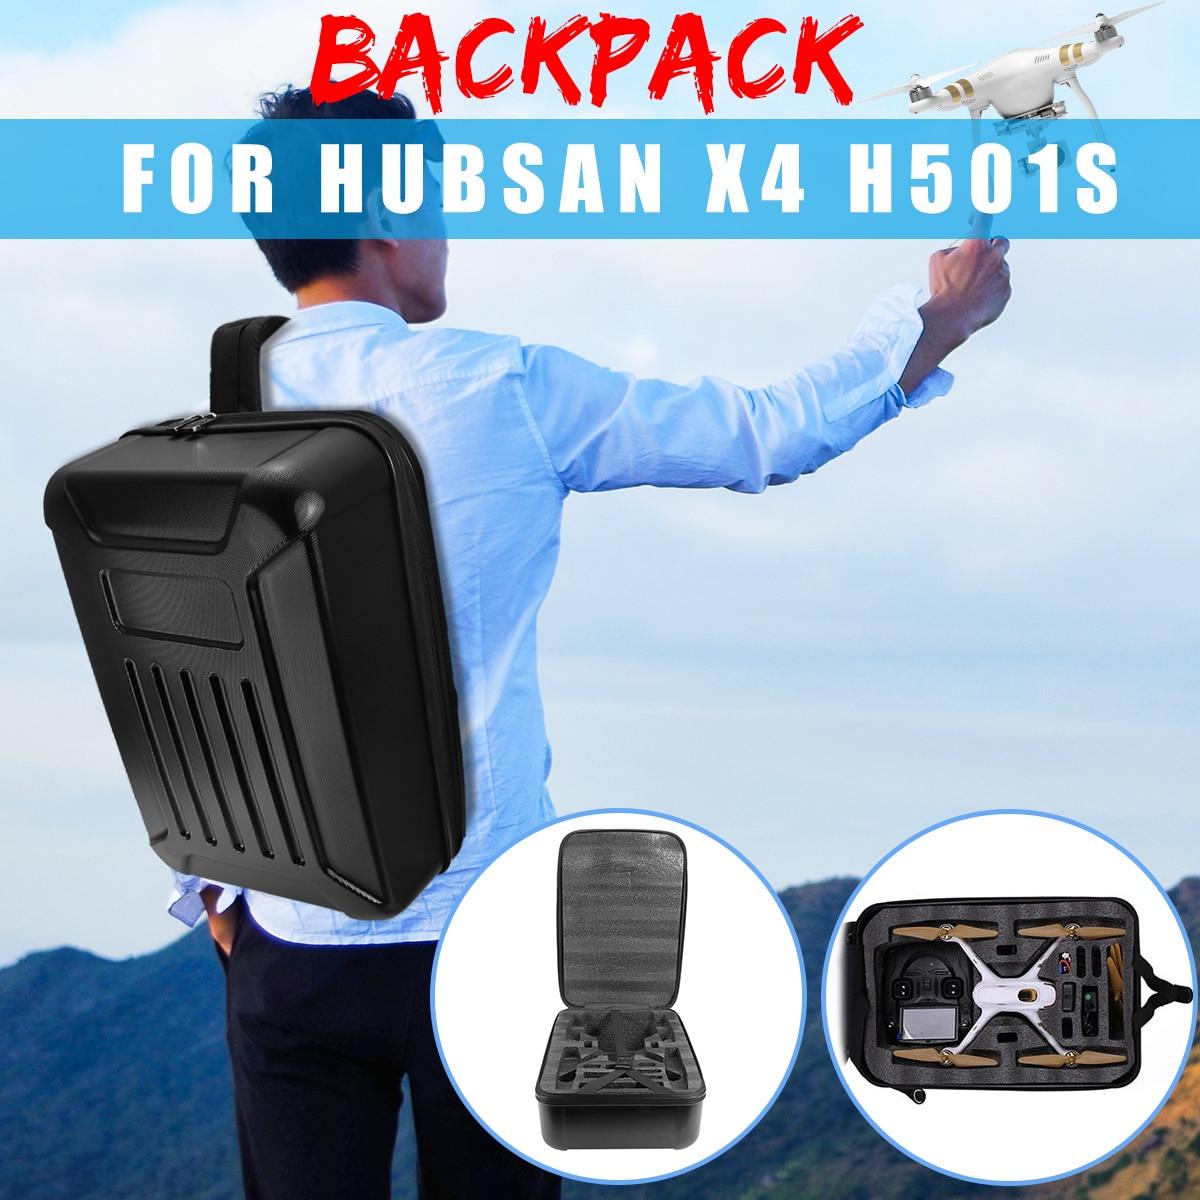 Negro impermeable Hard Shell mochila bolsa caja para Hubsan X4 H501S y H501C Cámara Drone Carrying Case